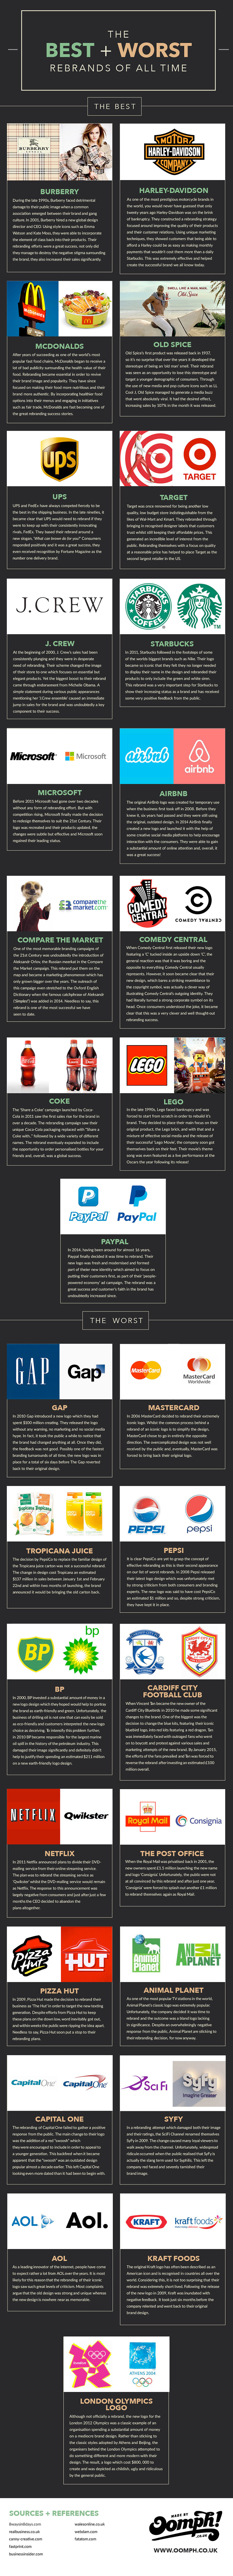 best-worst-business-rebands-infographic